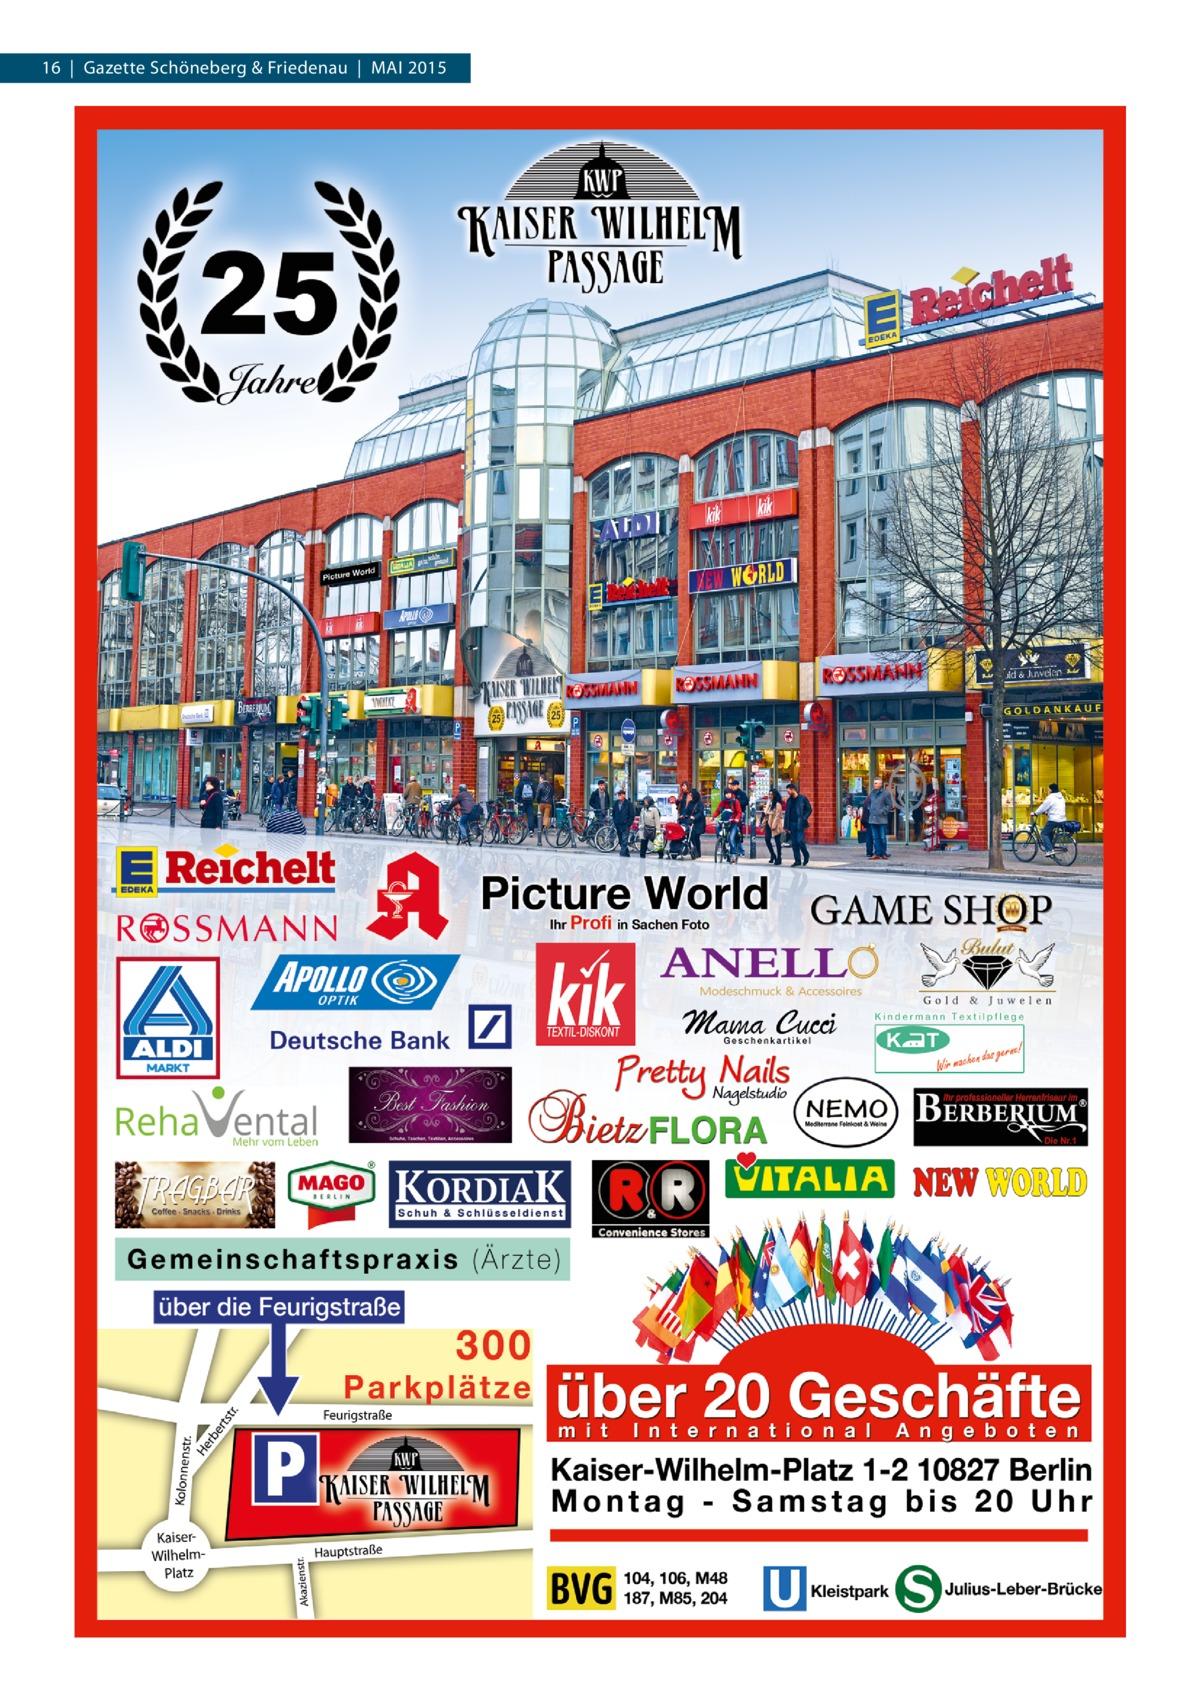 16 | Gazette Schöneberg & Friedenau | MAI 2015